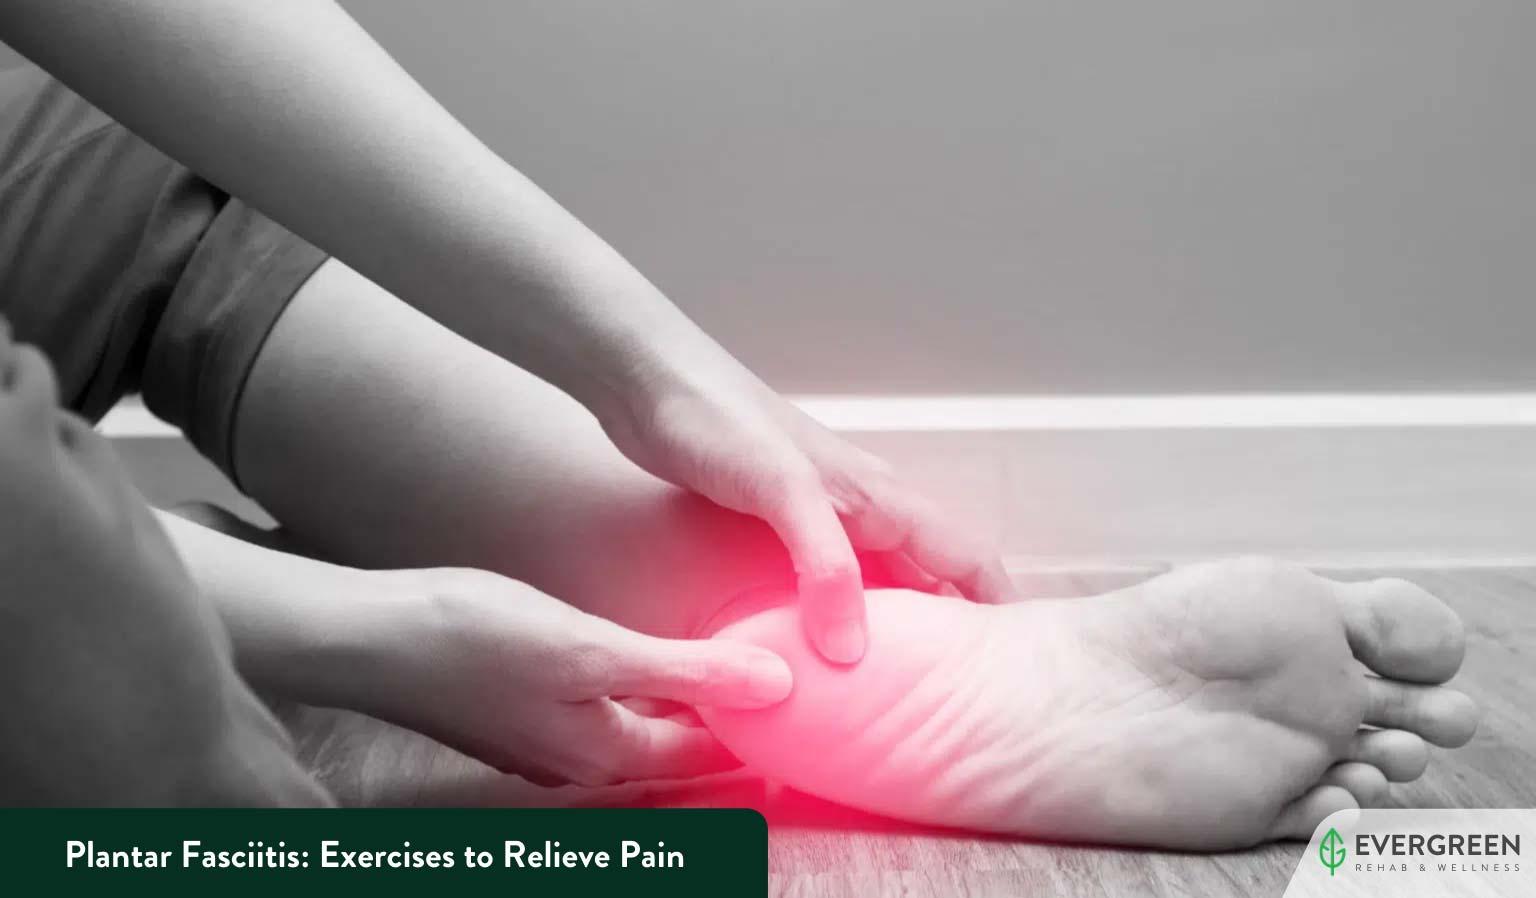 Plantar Fasciitis: Exercises to Relieve Pain